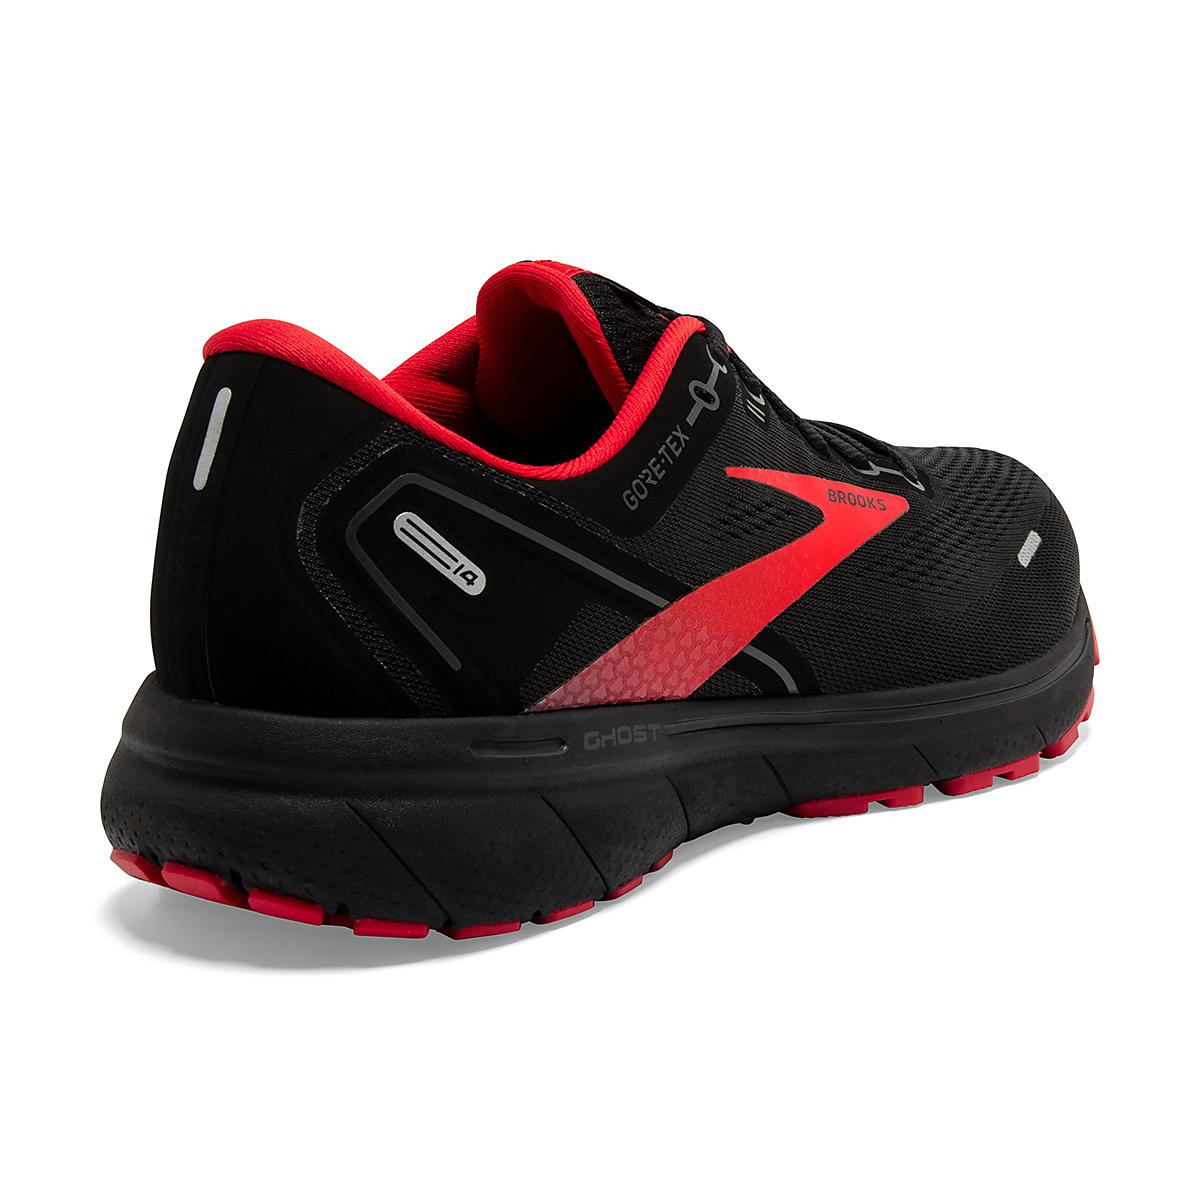 Men's Brooks Ghost 14 Gore-Tex Running Shoe - Color: Black/Blackened - Size: 7 - Width: Regular, Black/Blackened, large, image 6